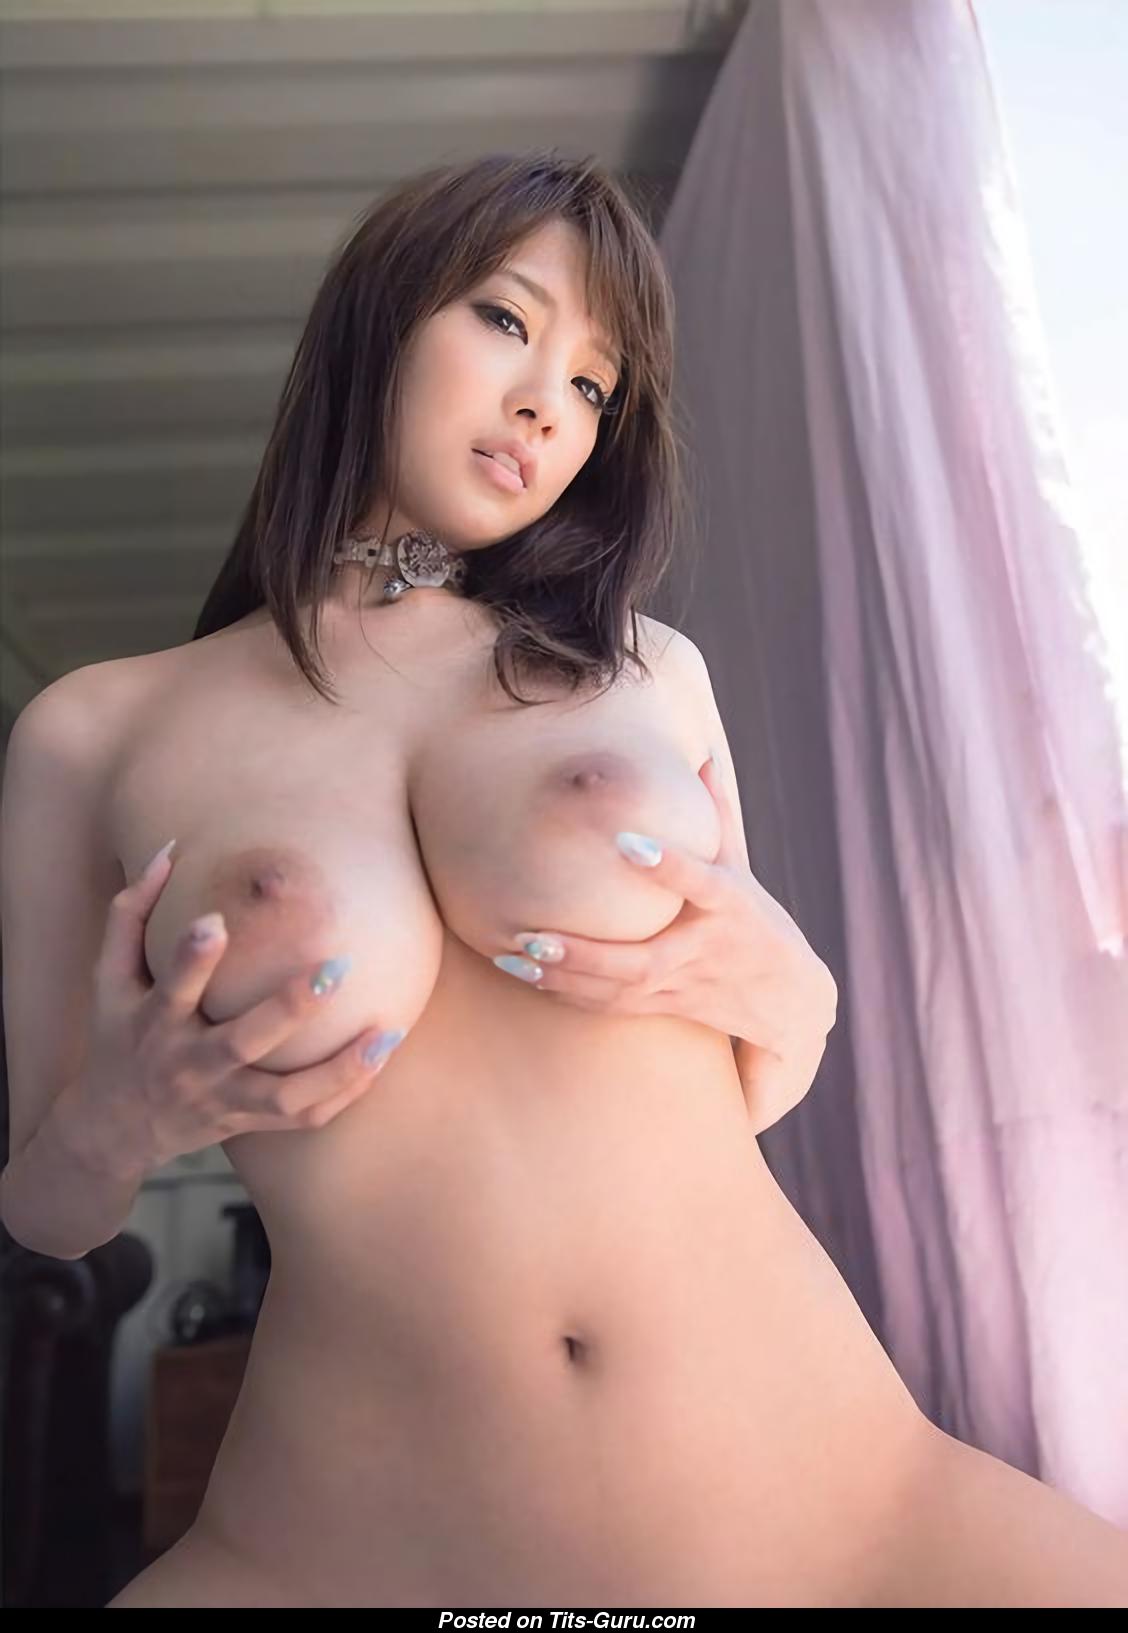 fascinating japanese nude girl